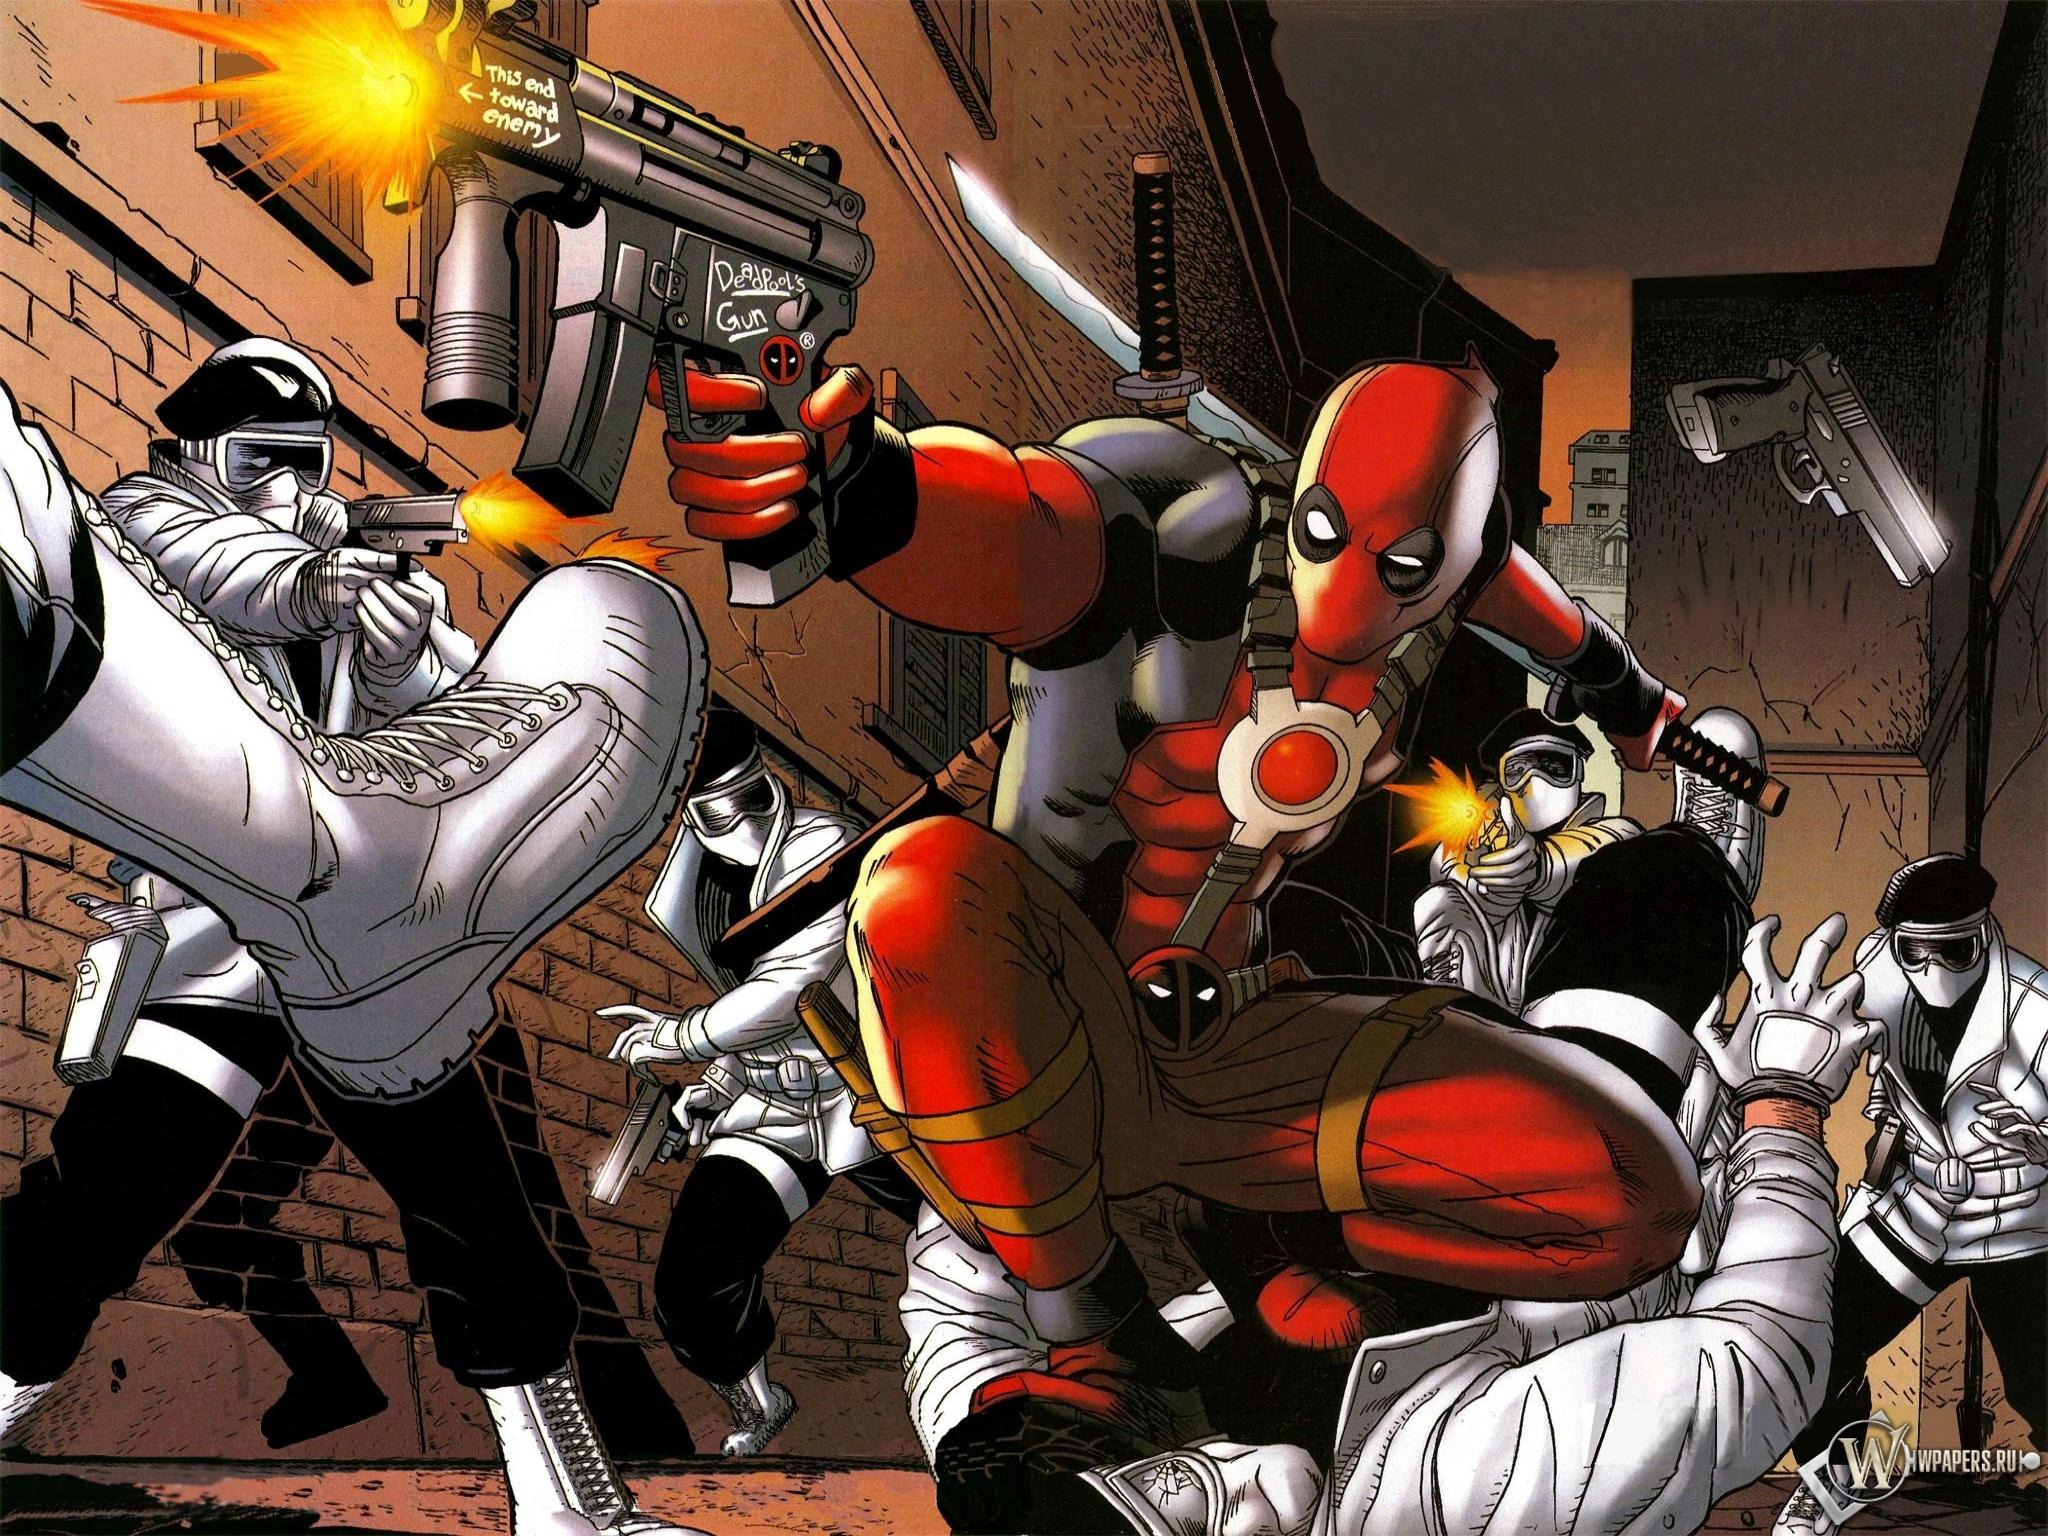 Deadpool wade wilson 2048x1536